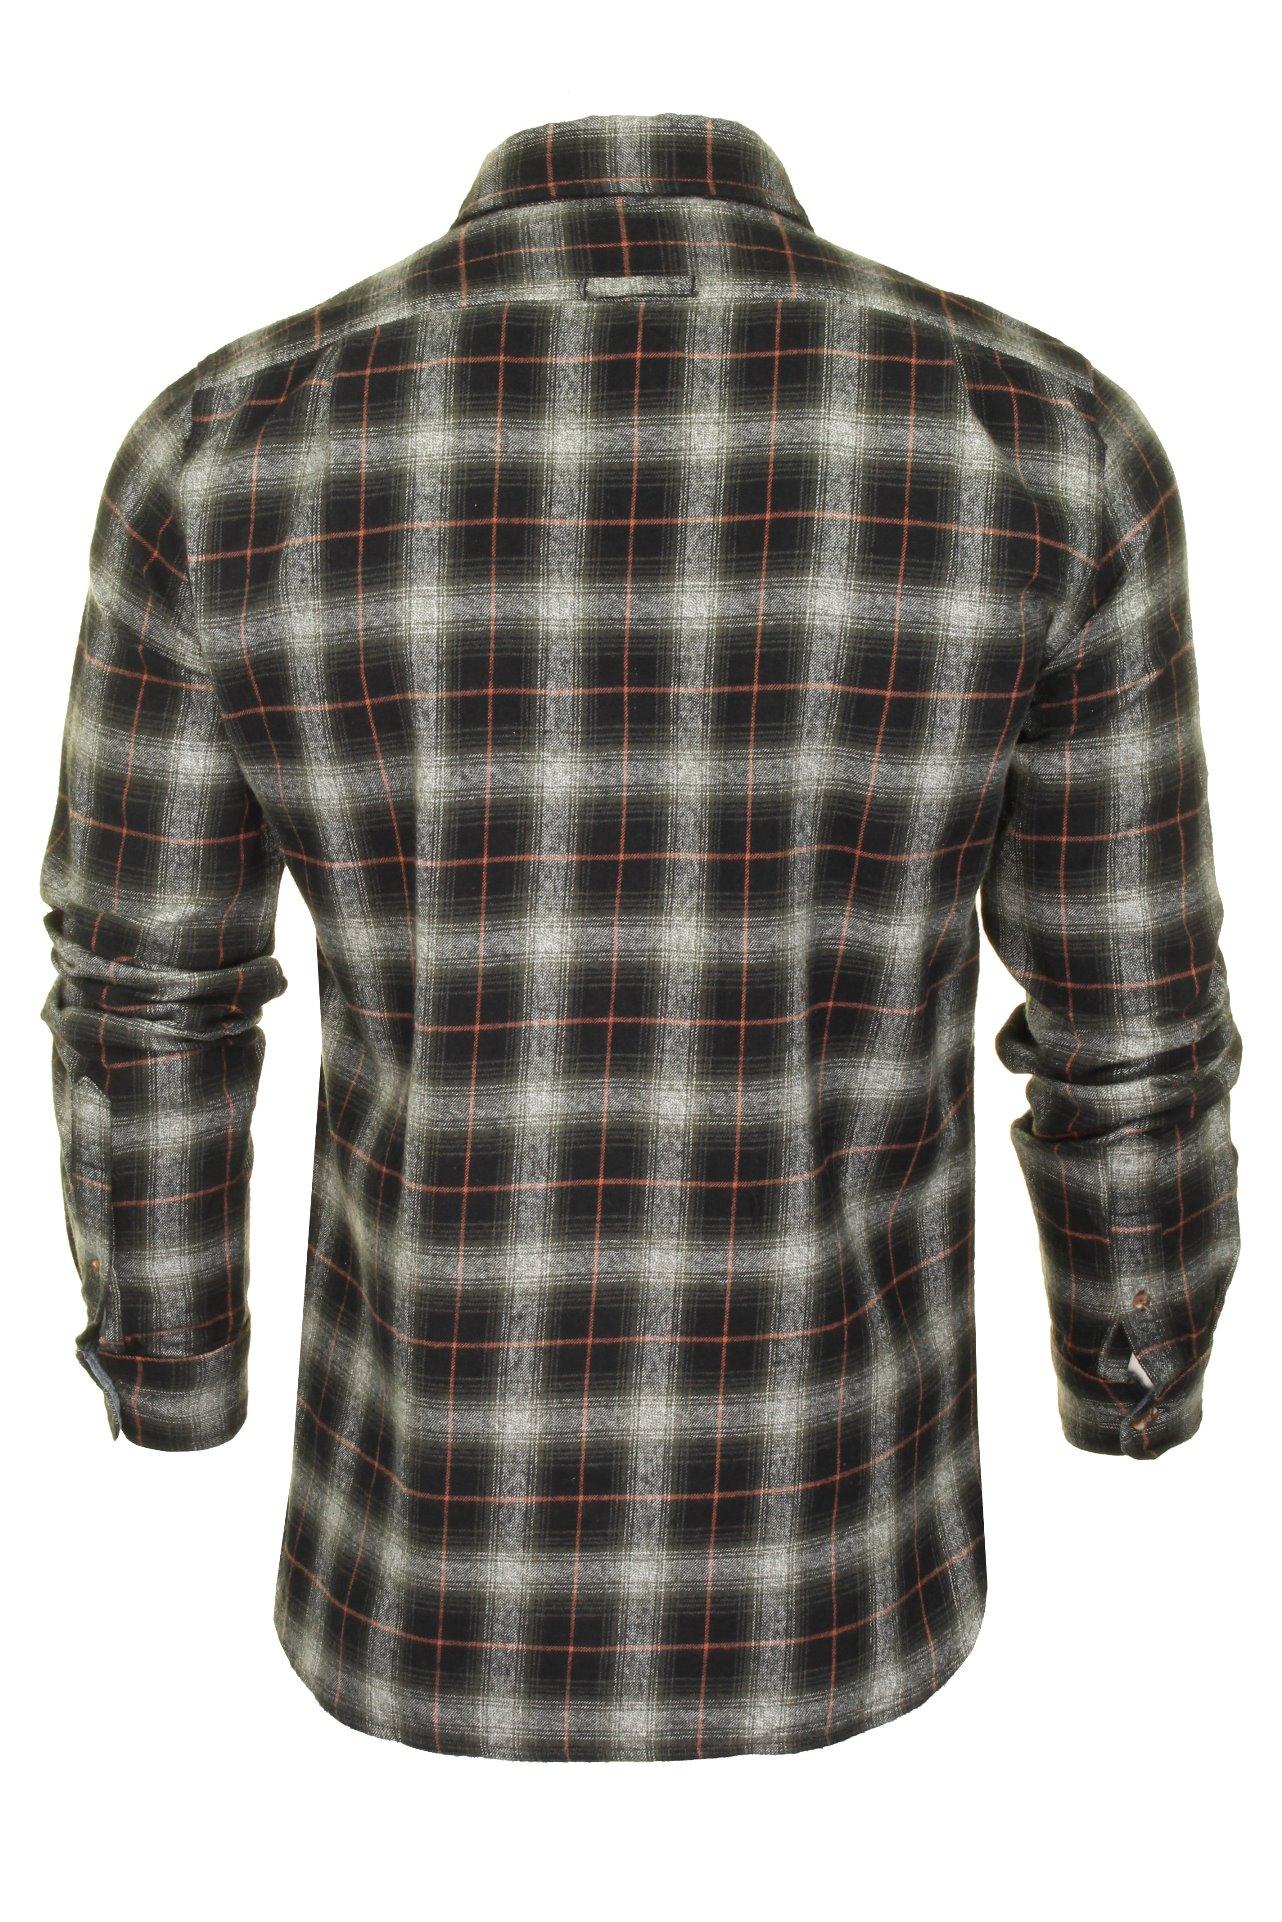 Superdry-Mens-Check-Shirt-039-Classic-Lumberjack-Shirt-039-Long-Sleeved thumbnail 5